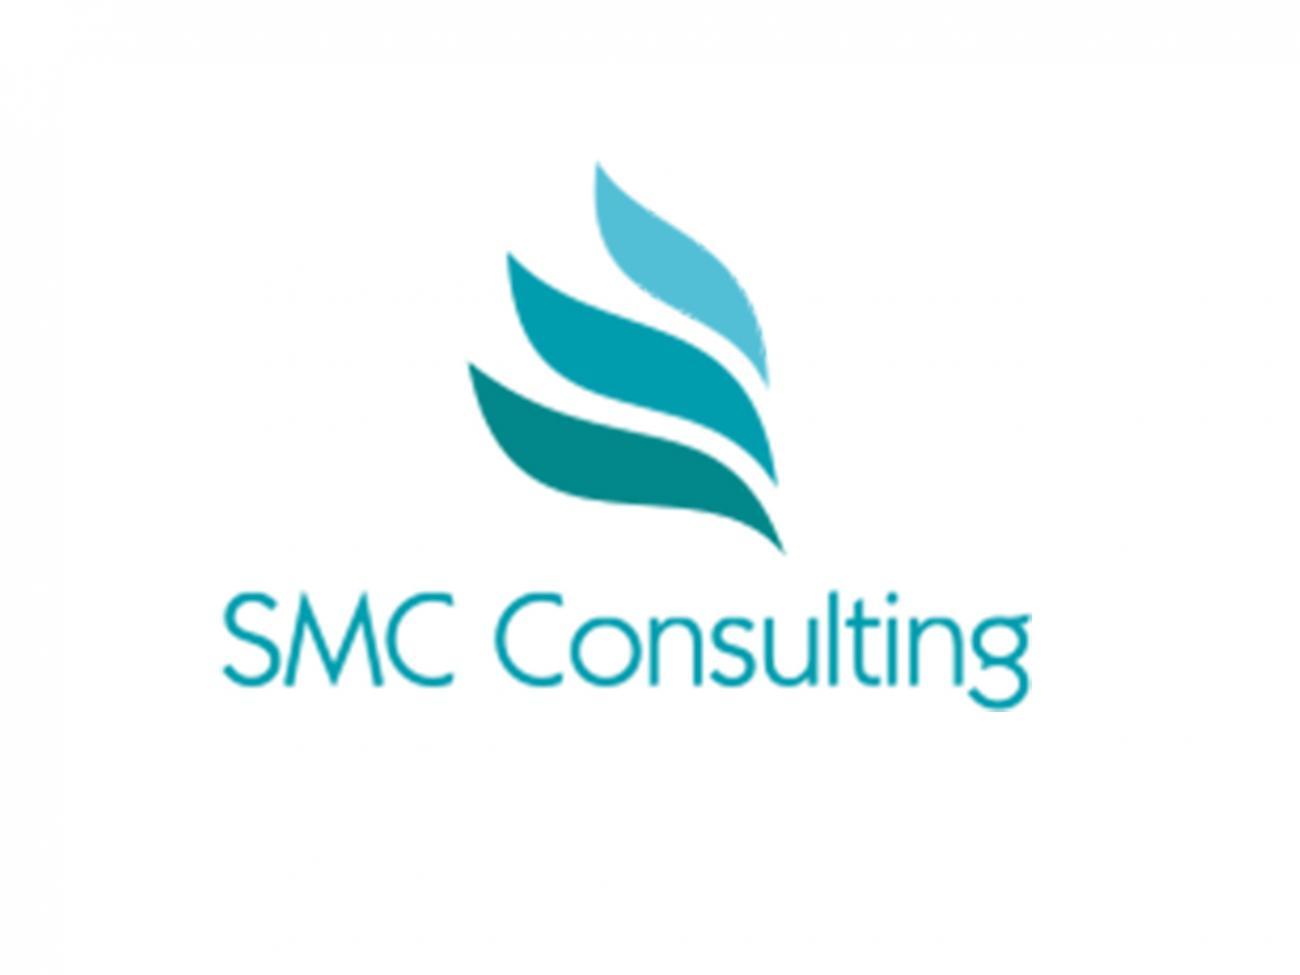 Smcconsulting logo